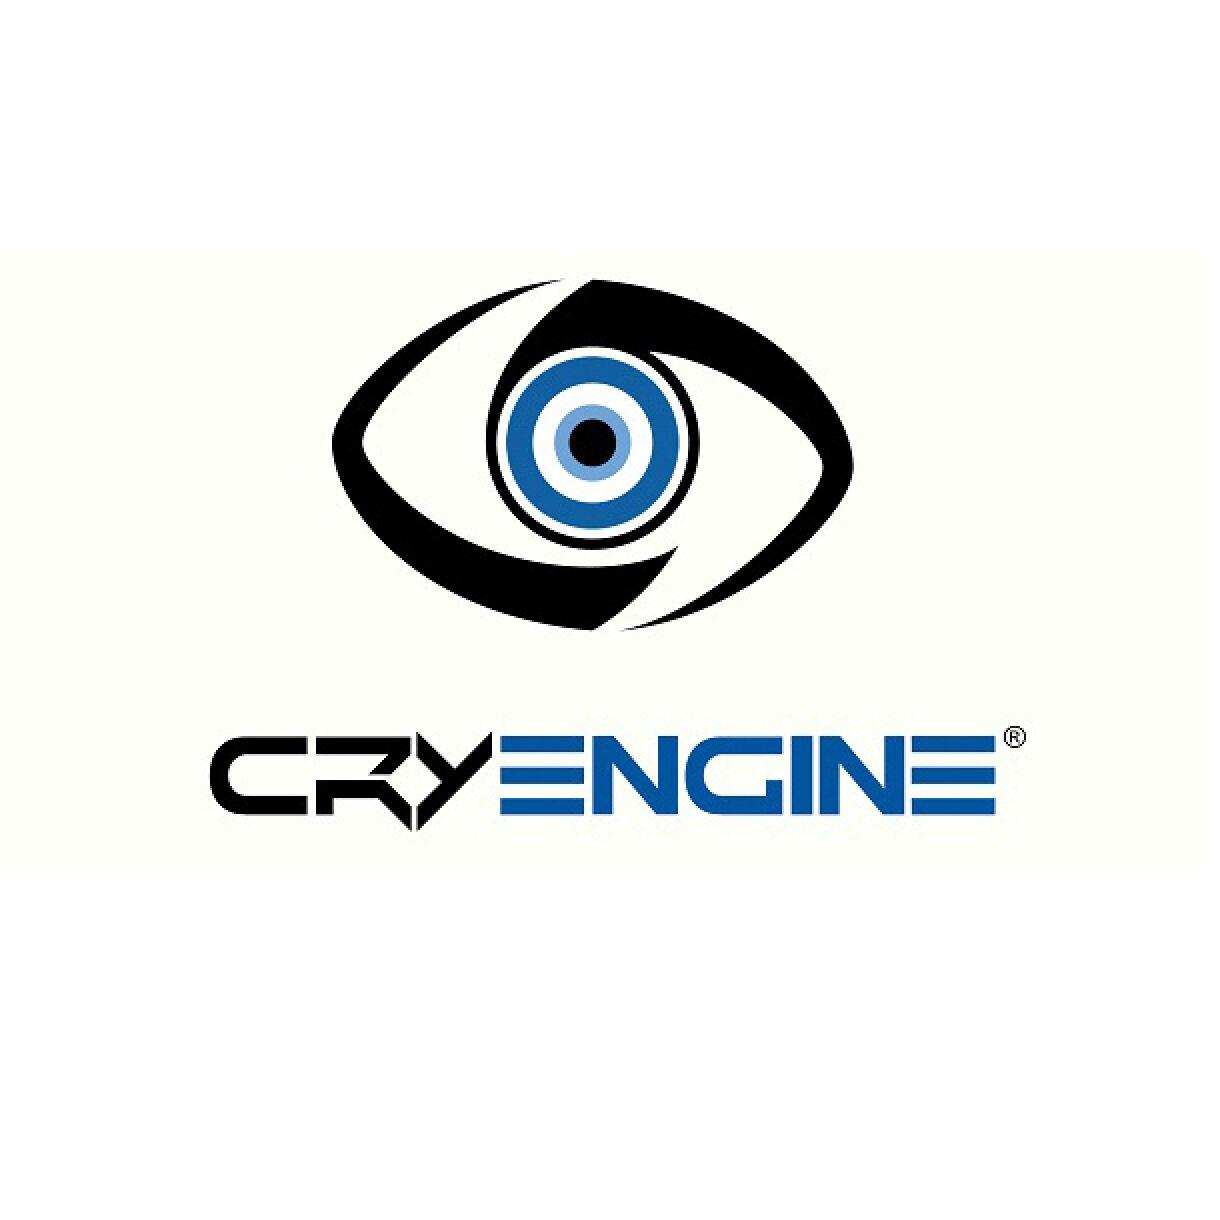 Rumors: Amazon Bought CryEngine for $50-70m